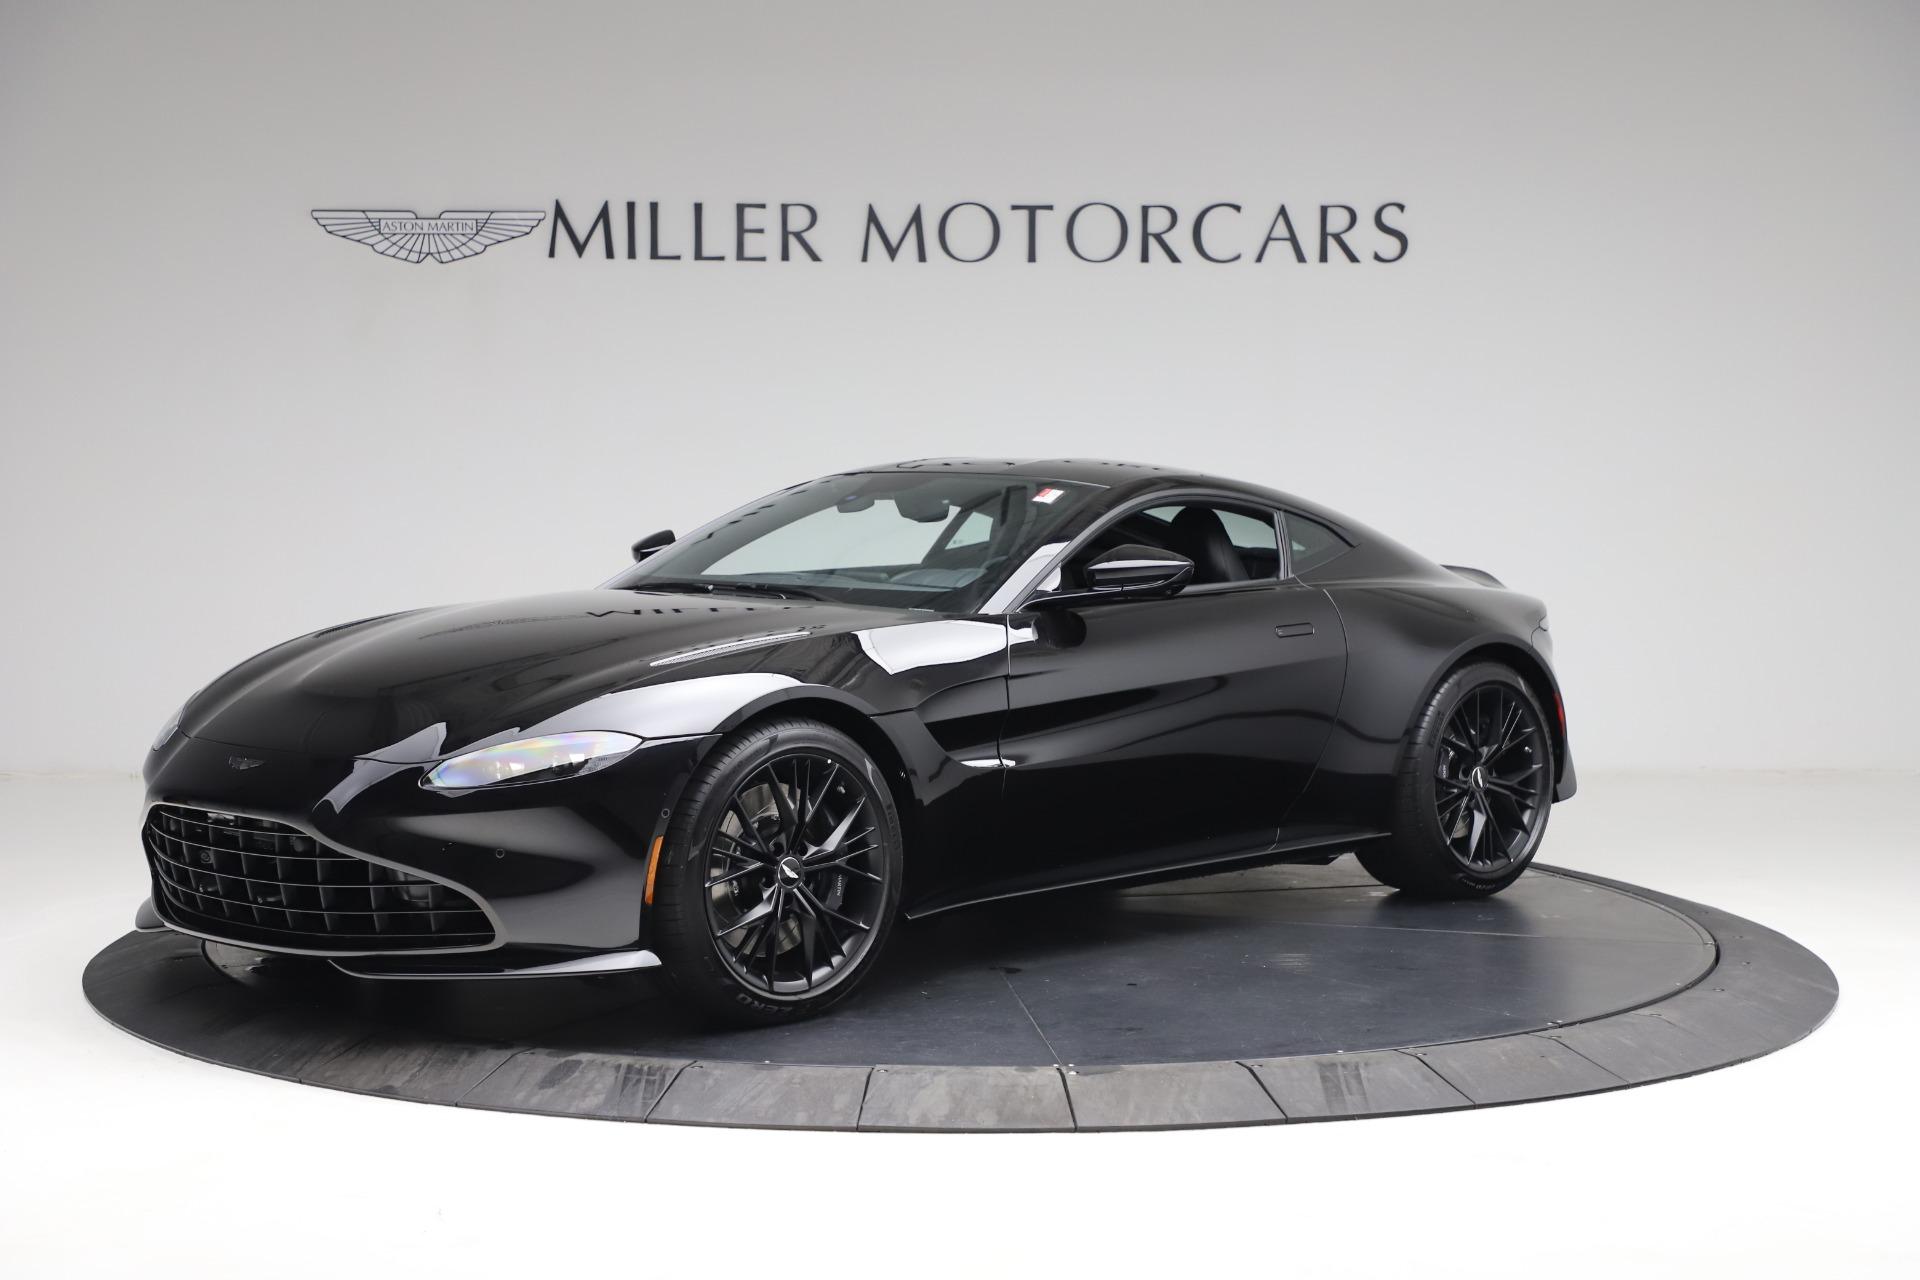 New 2021 Aston Martin Vantage for sale Sold at Bugatti of Greenwich in Greenwich CT 06830 1